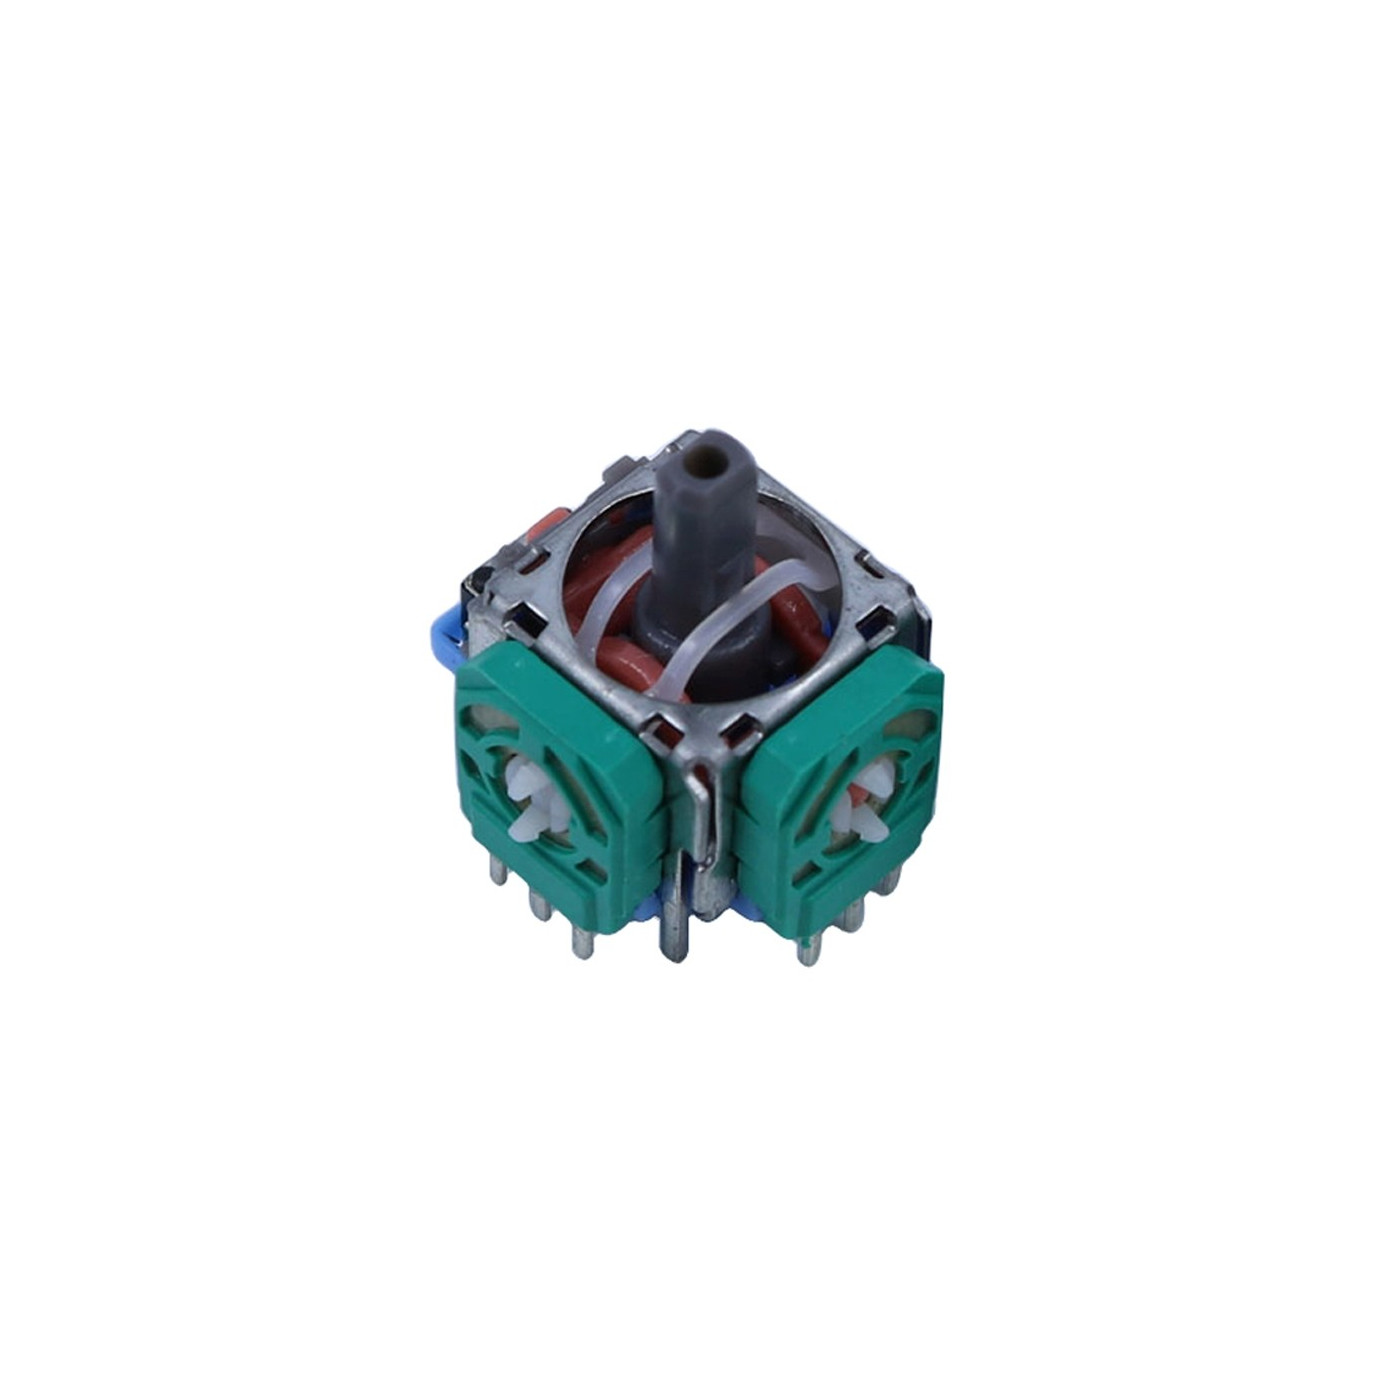 Controller analogico 3D joystick per playpastion 4 - ps4 Stick joypad